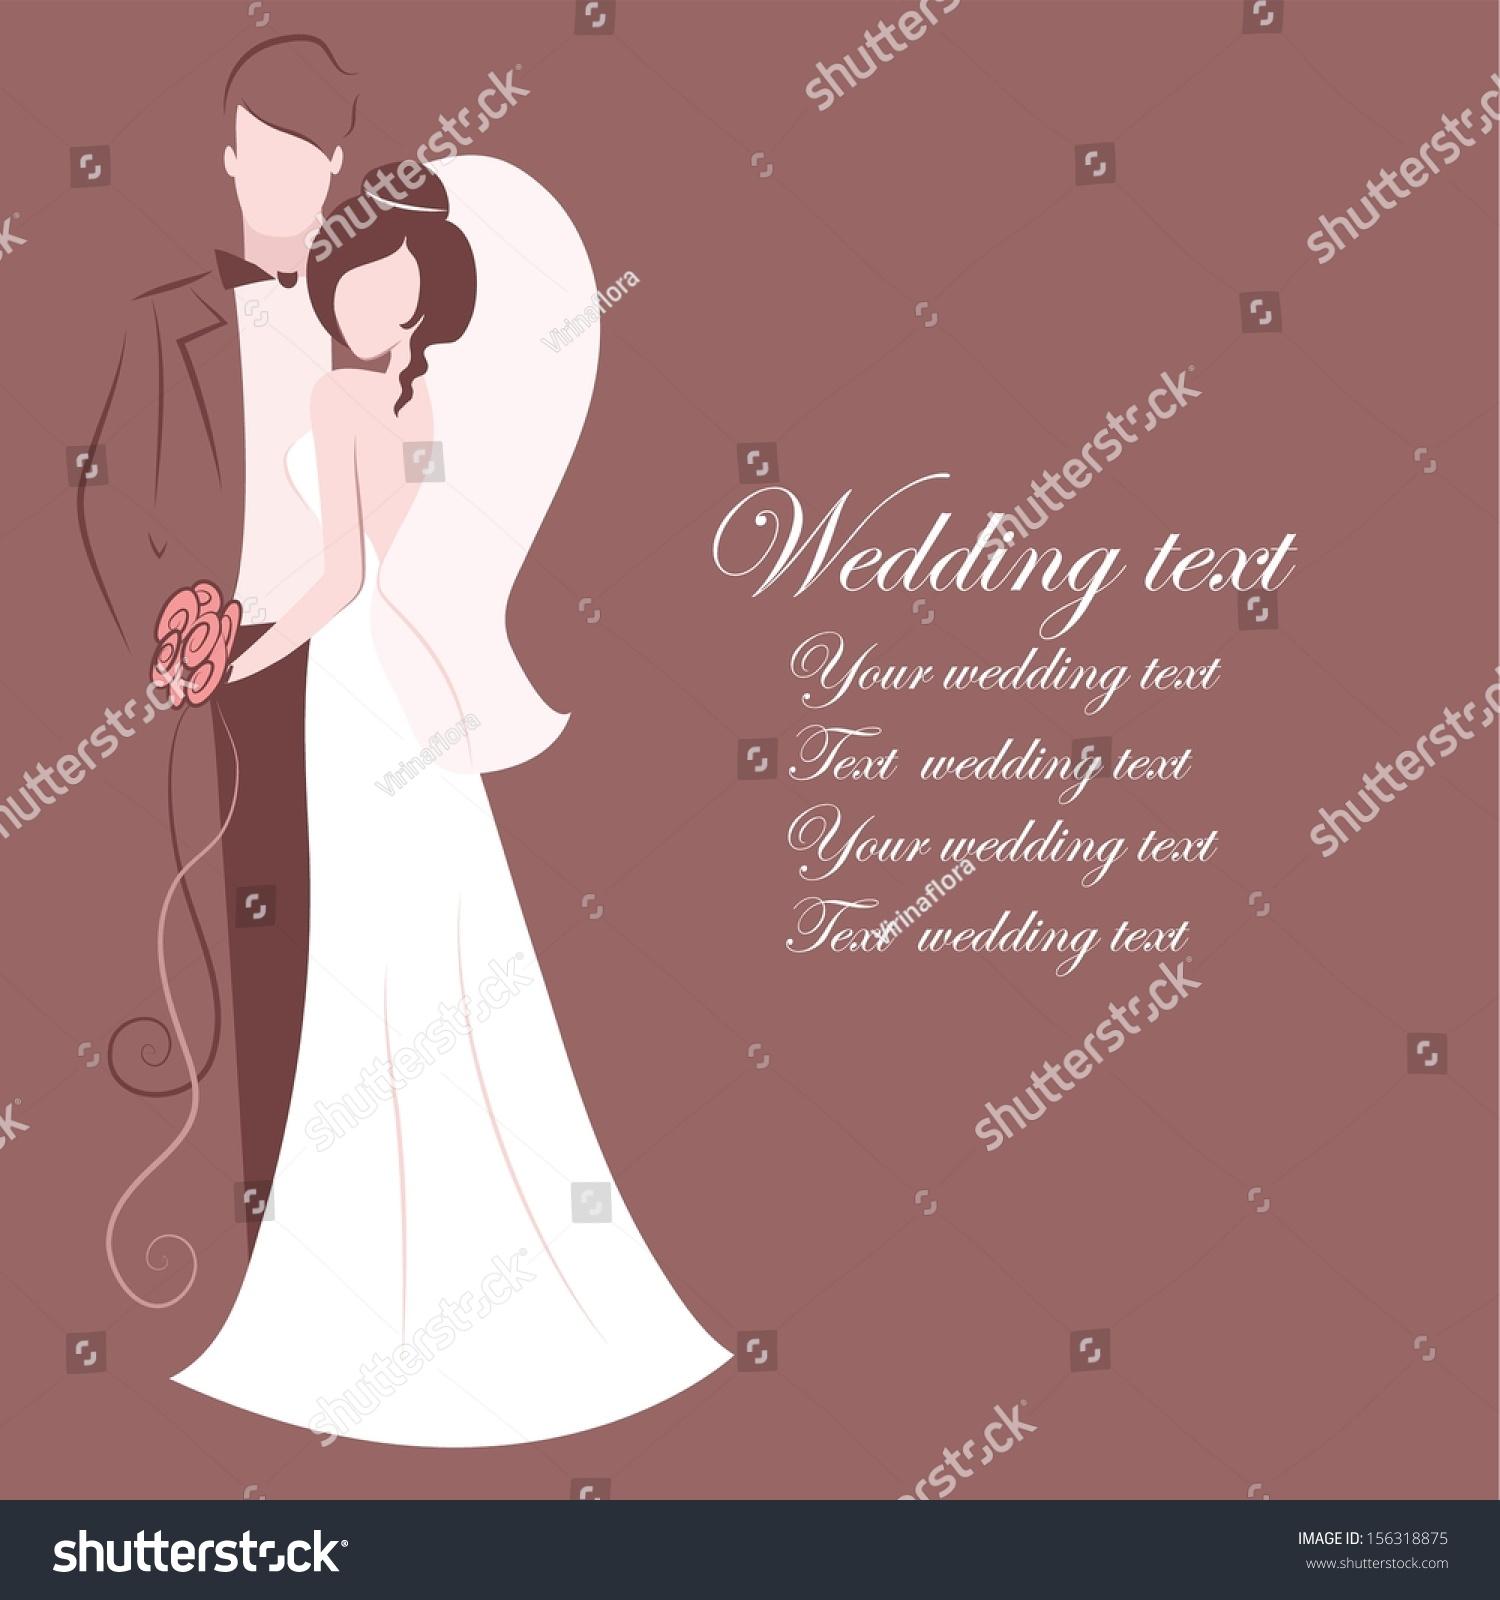 Silhouette Bride Groom Background Wedding Invitation Stock Vector ...